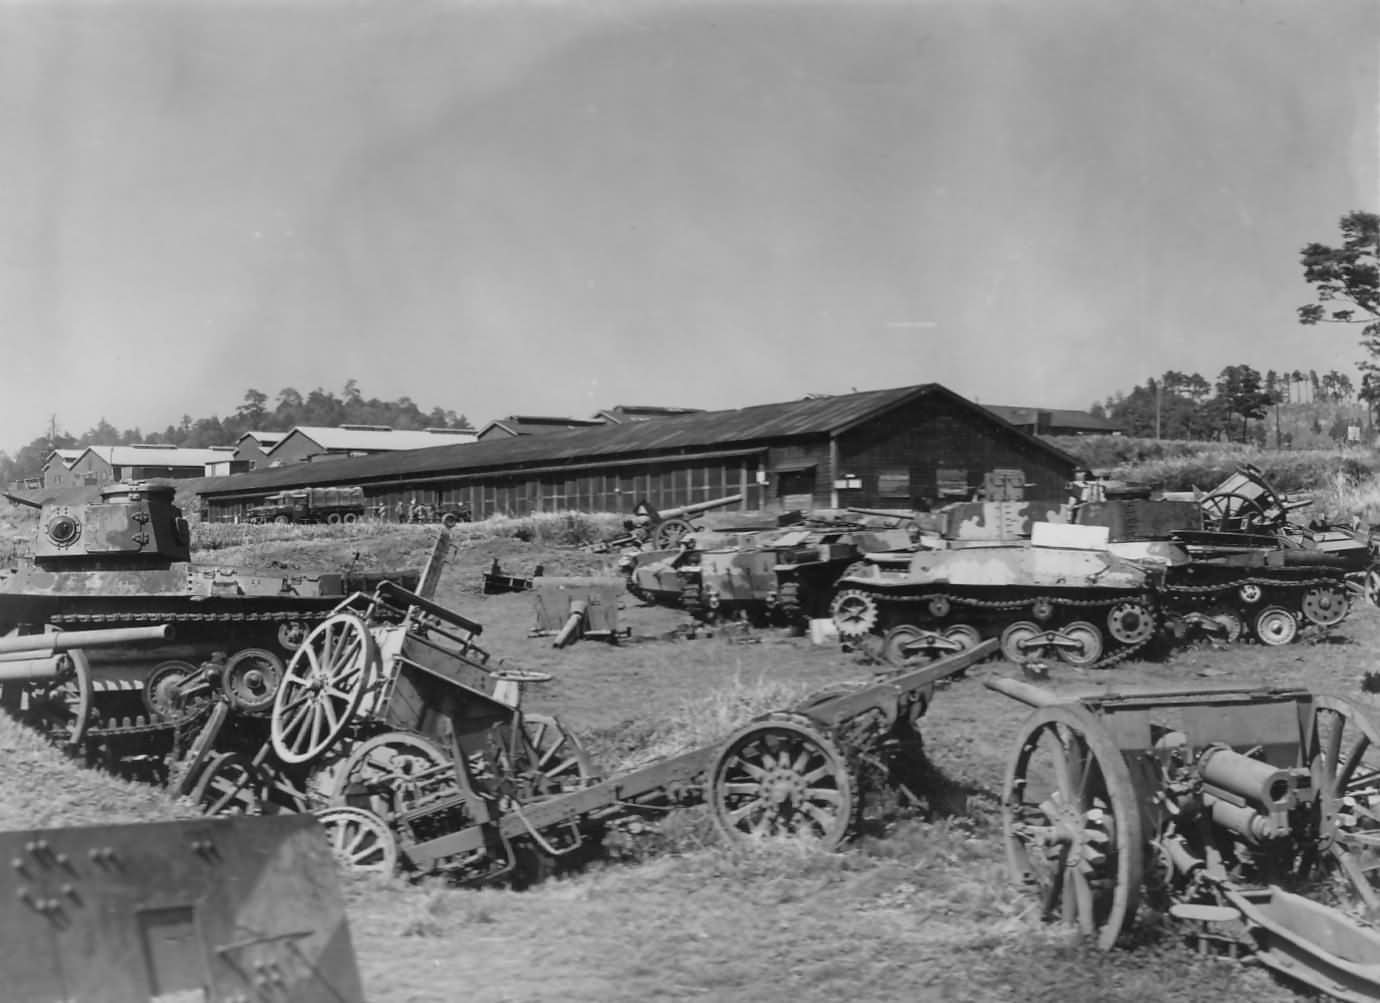 Japanese Type 95 Ha-Go Tanks Wrecks and Artillery in Japan ...